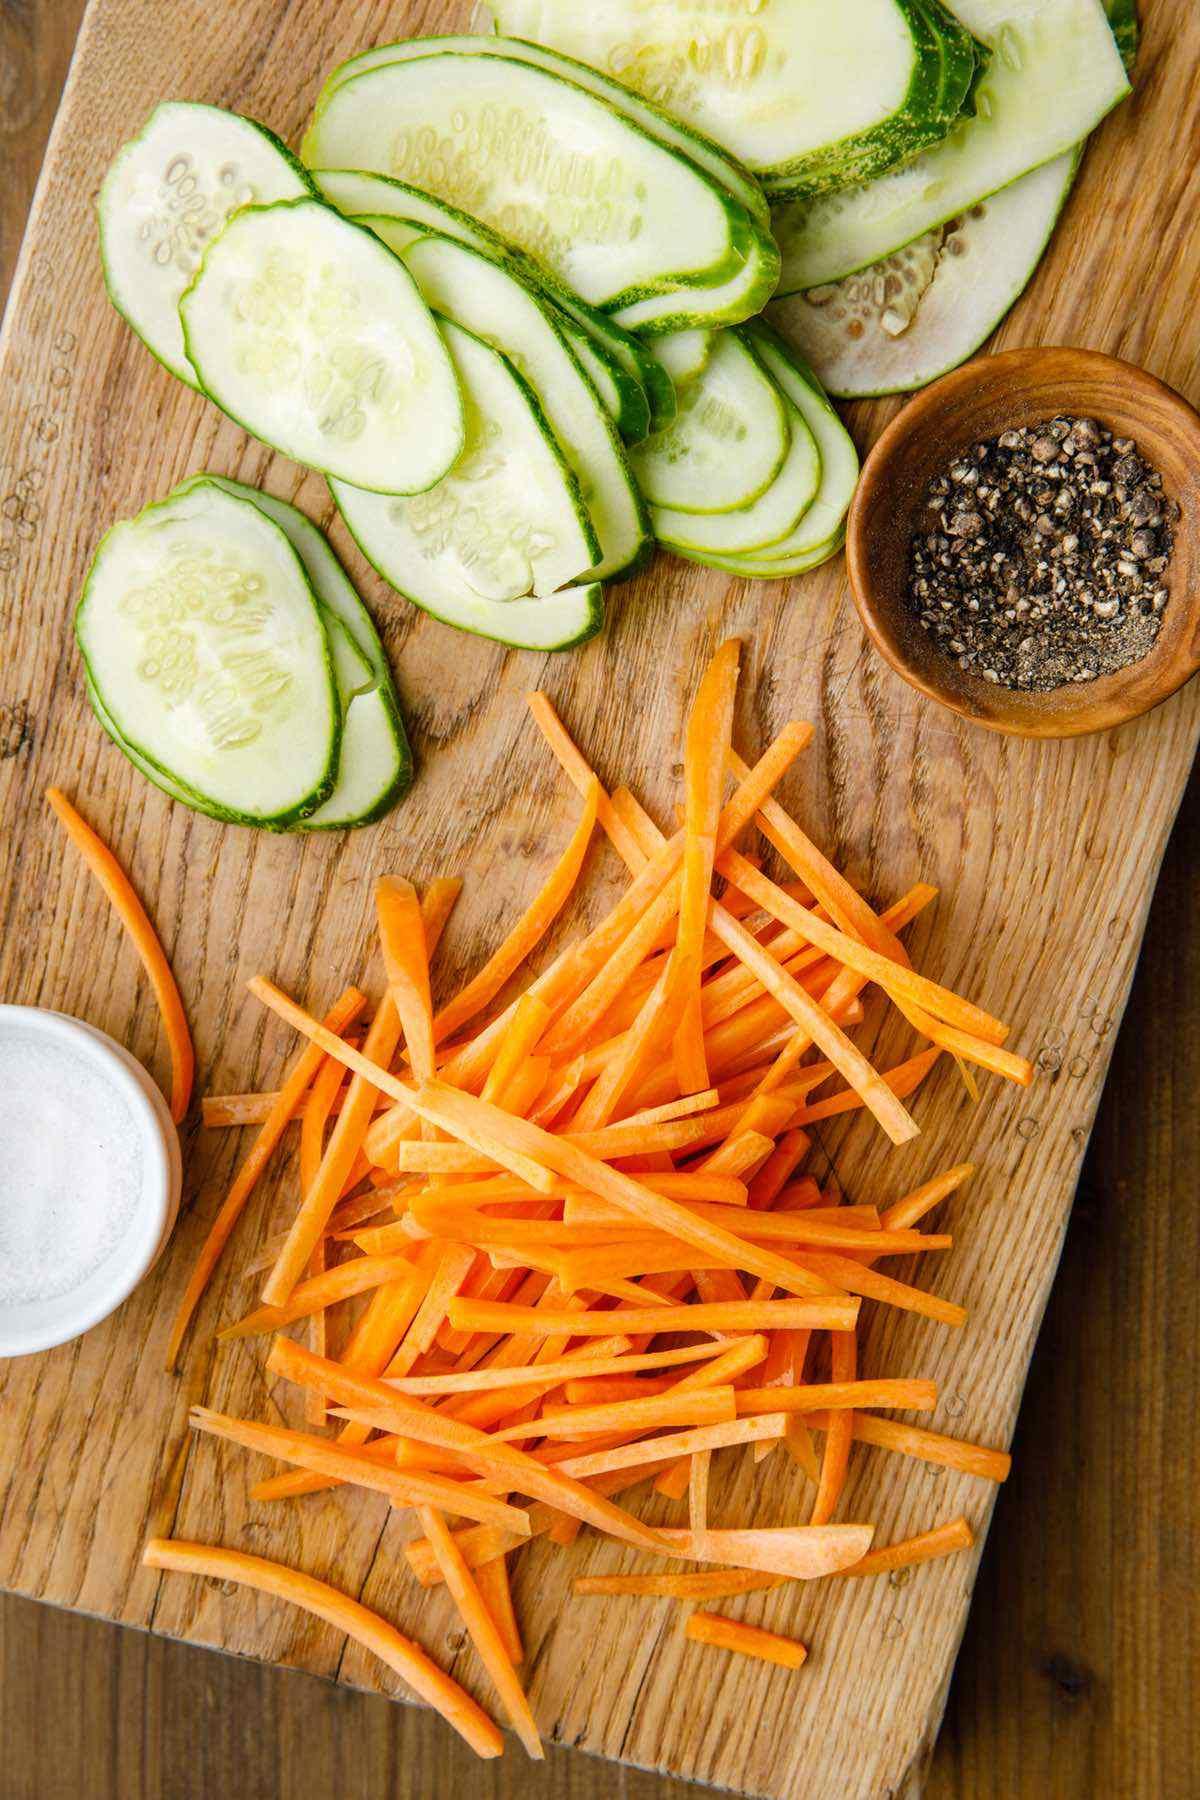 prepping raw veggies